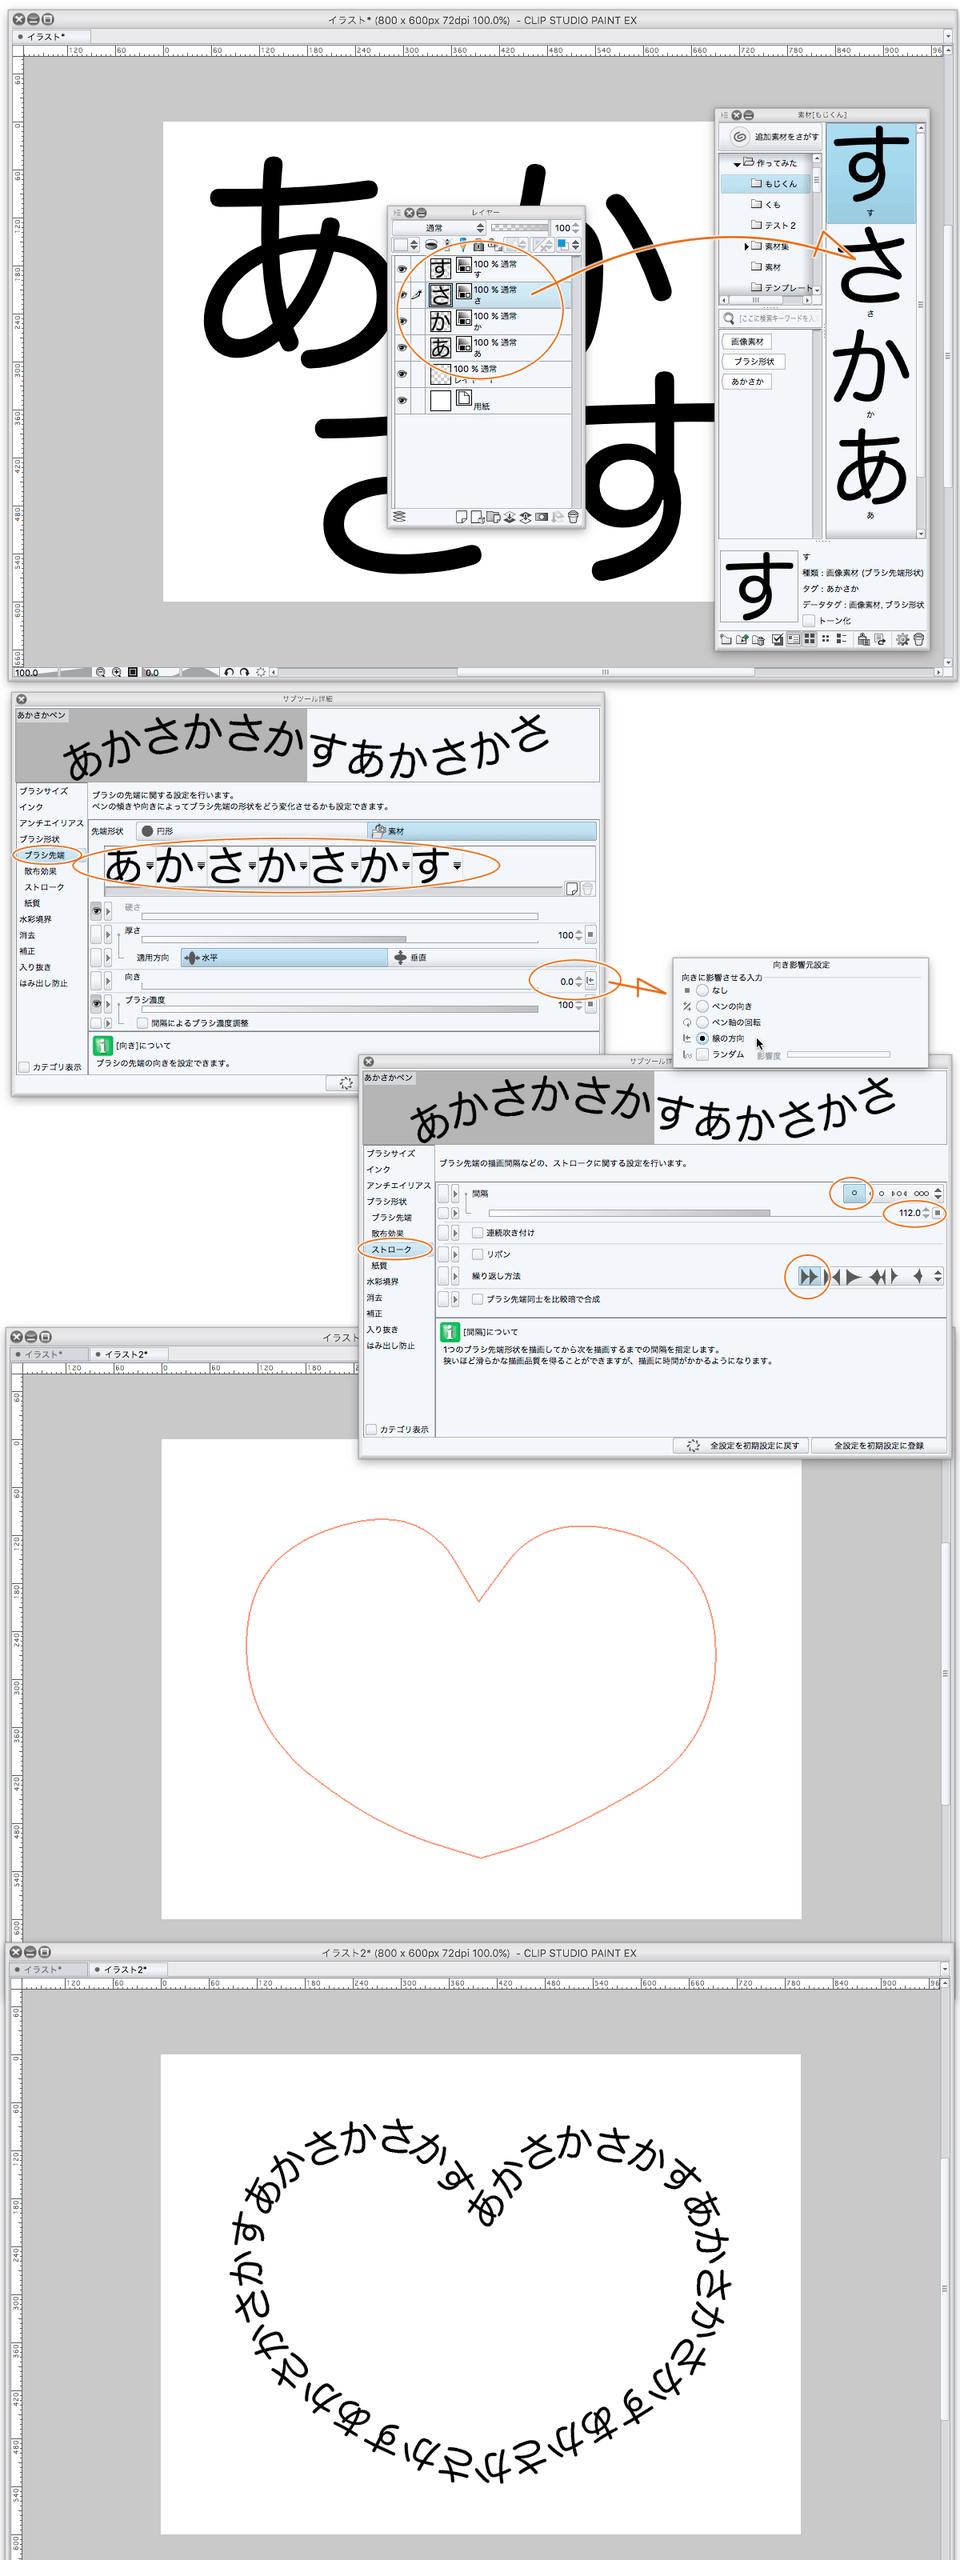 How to make circular text? - CLIP STUDIO ASK